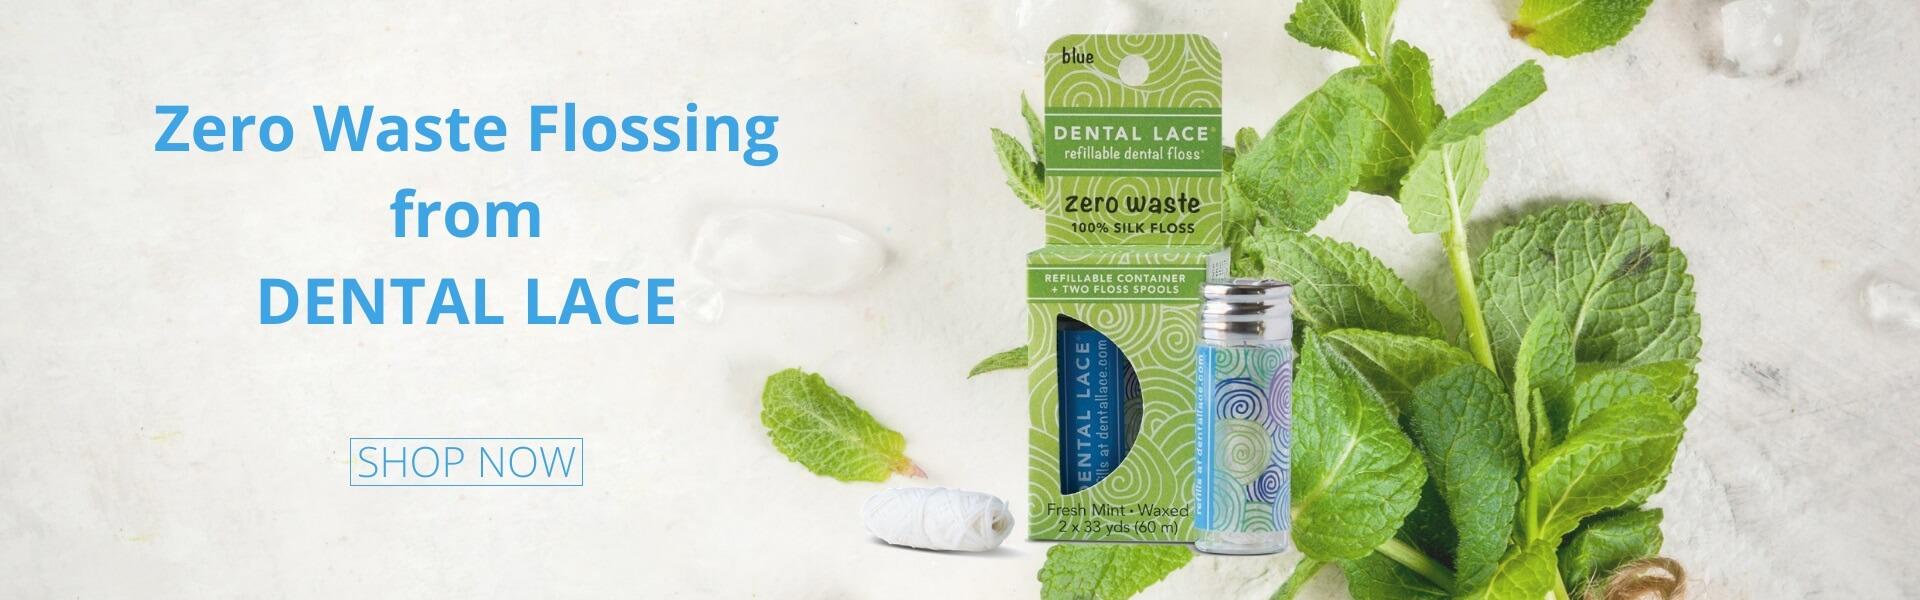 Dental Lace Zero Waste Floss